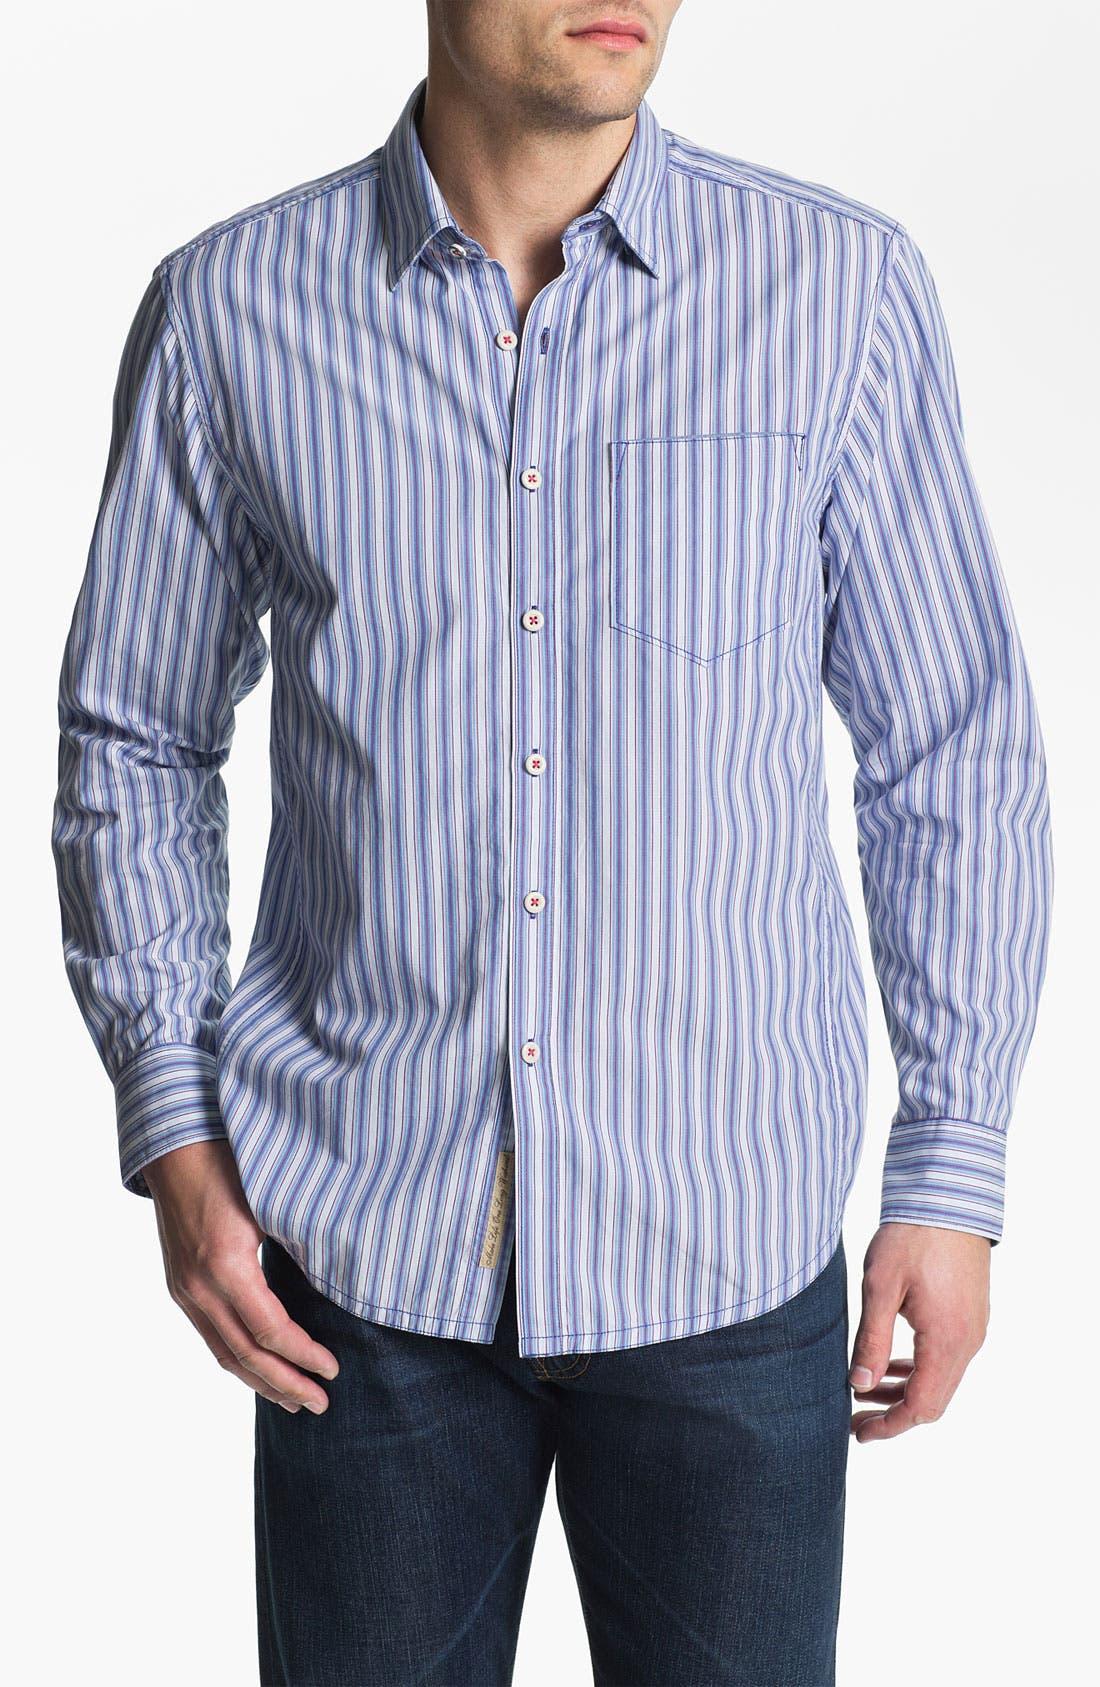 Alternate Image 1 Selected - Tommy Bahama Denim 'Stripe Tease' Sport Shirt